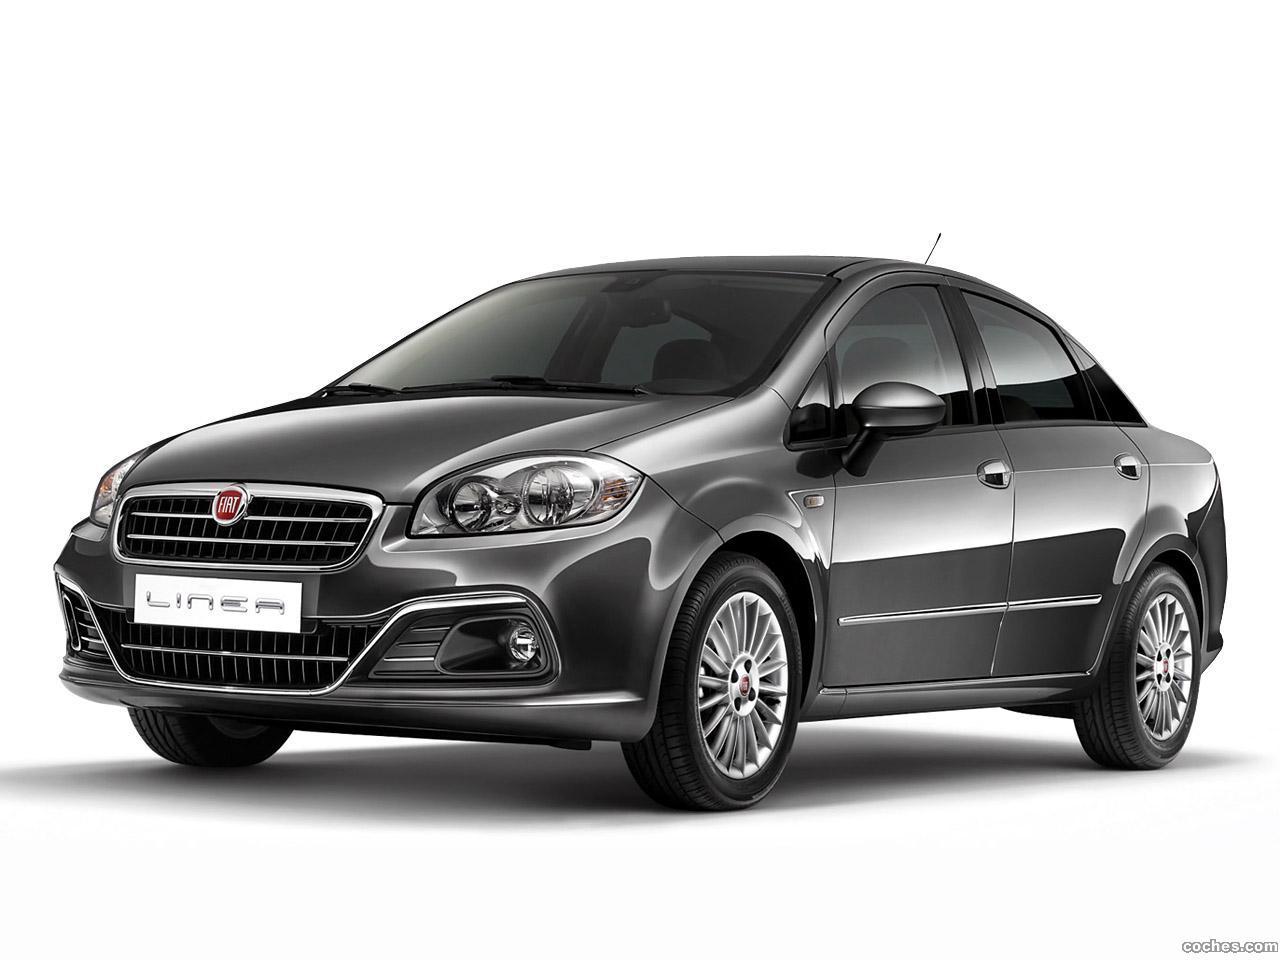 Foto 2 de Fiat Linea 2012